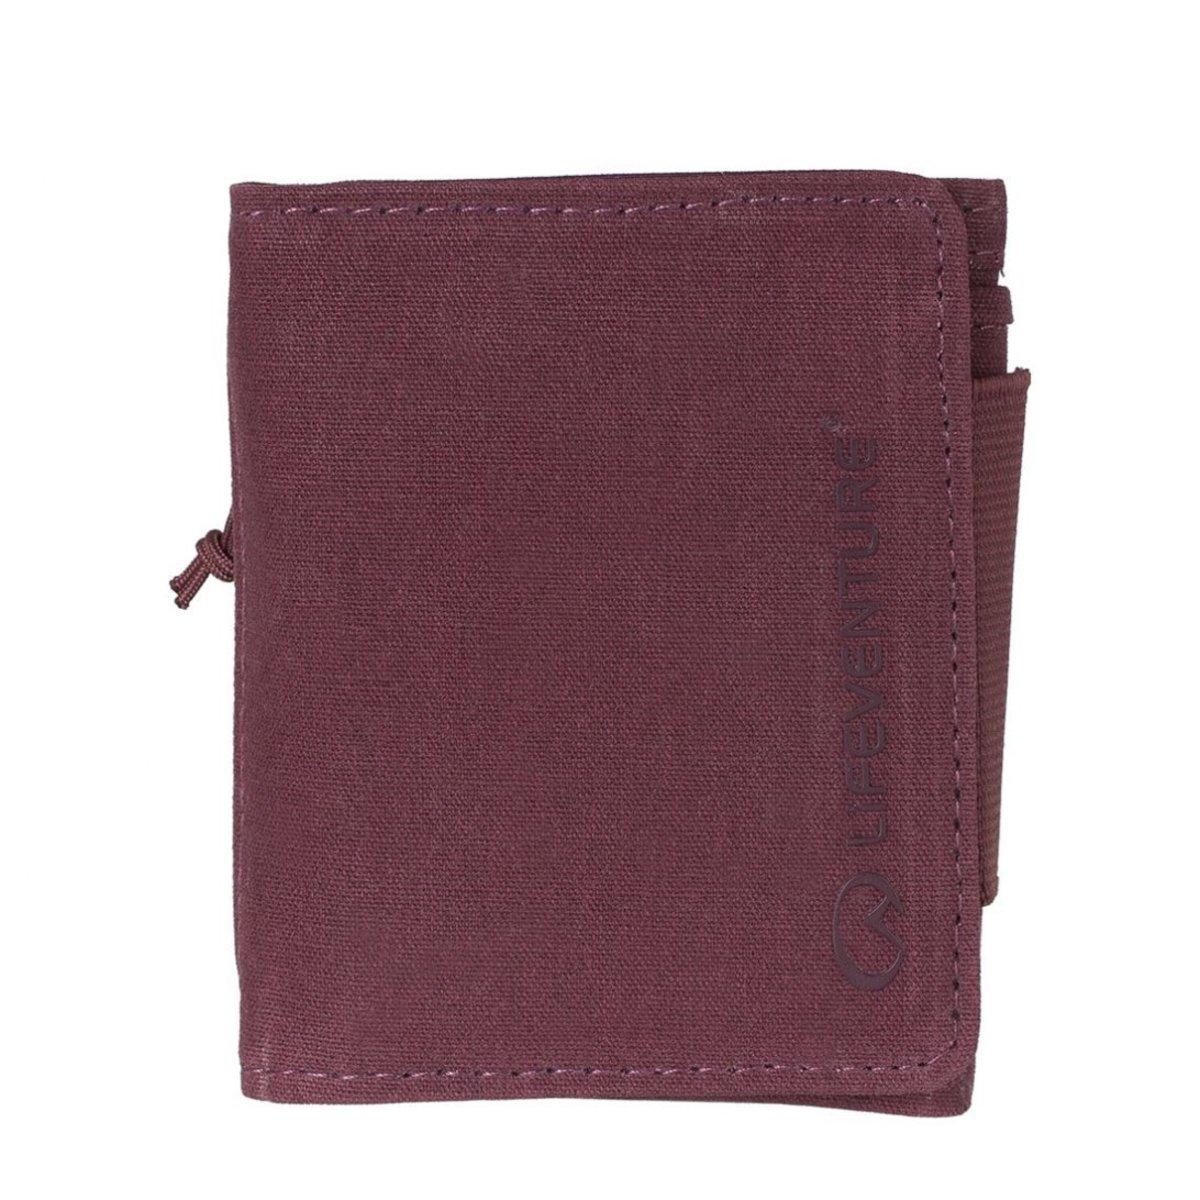 英國品牌防盜銀包 RFID Wallet Purple (New)